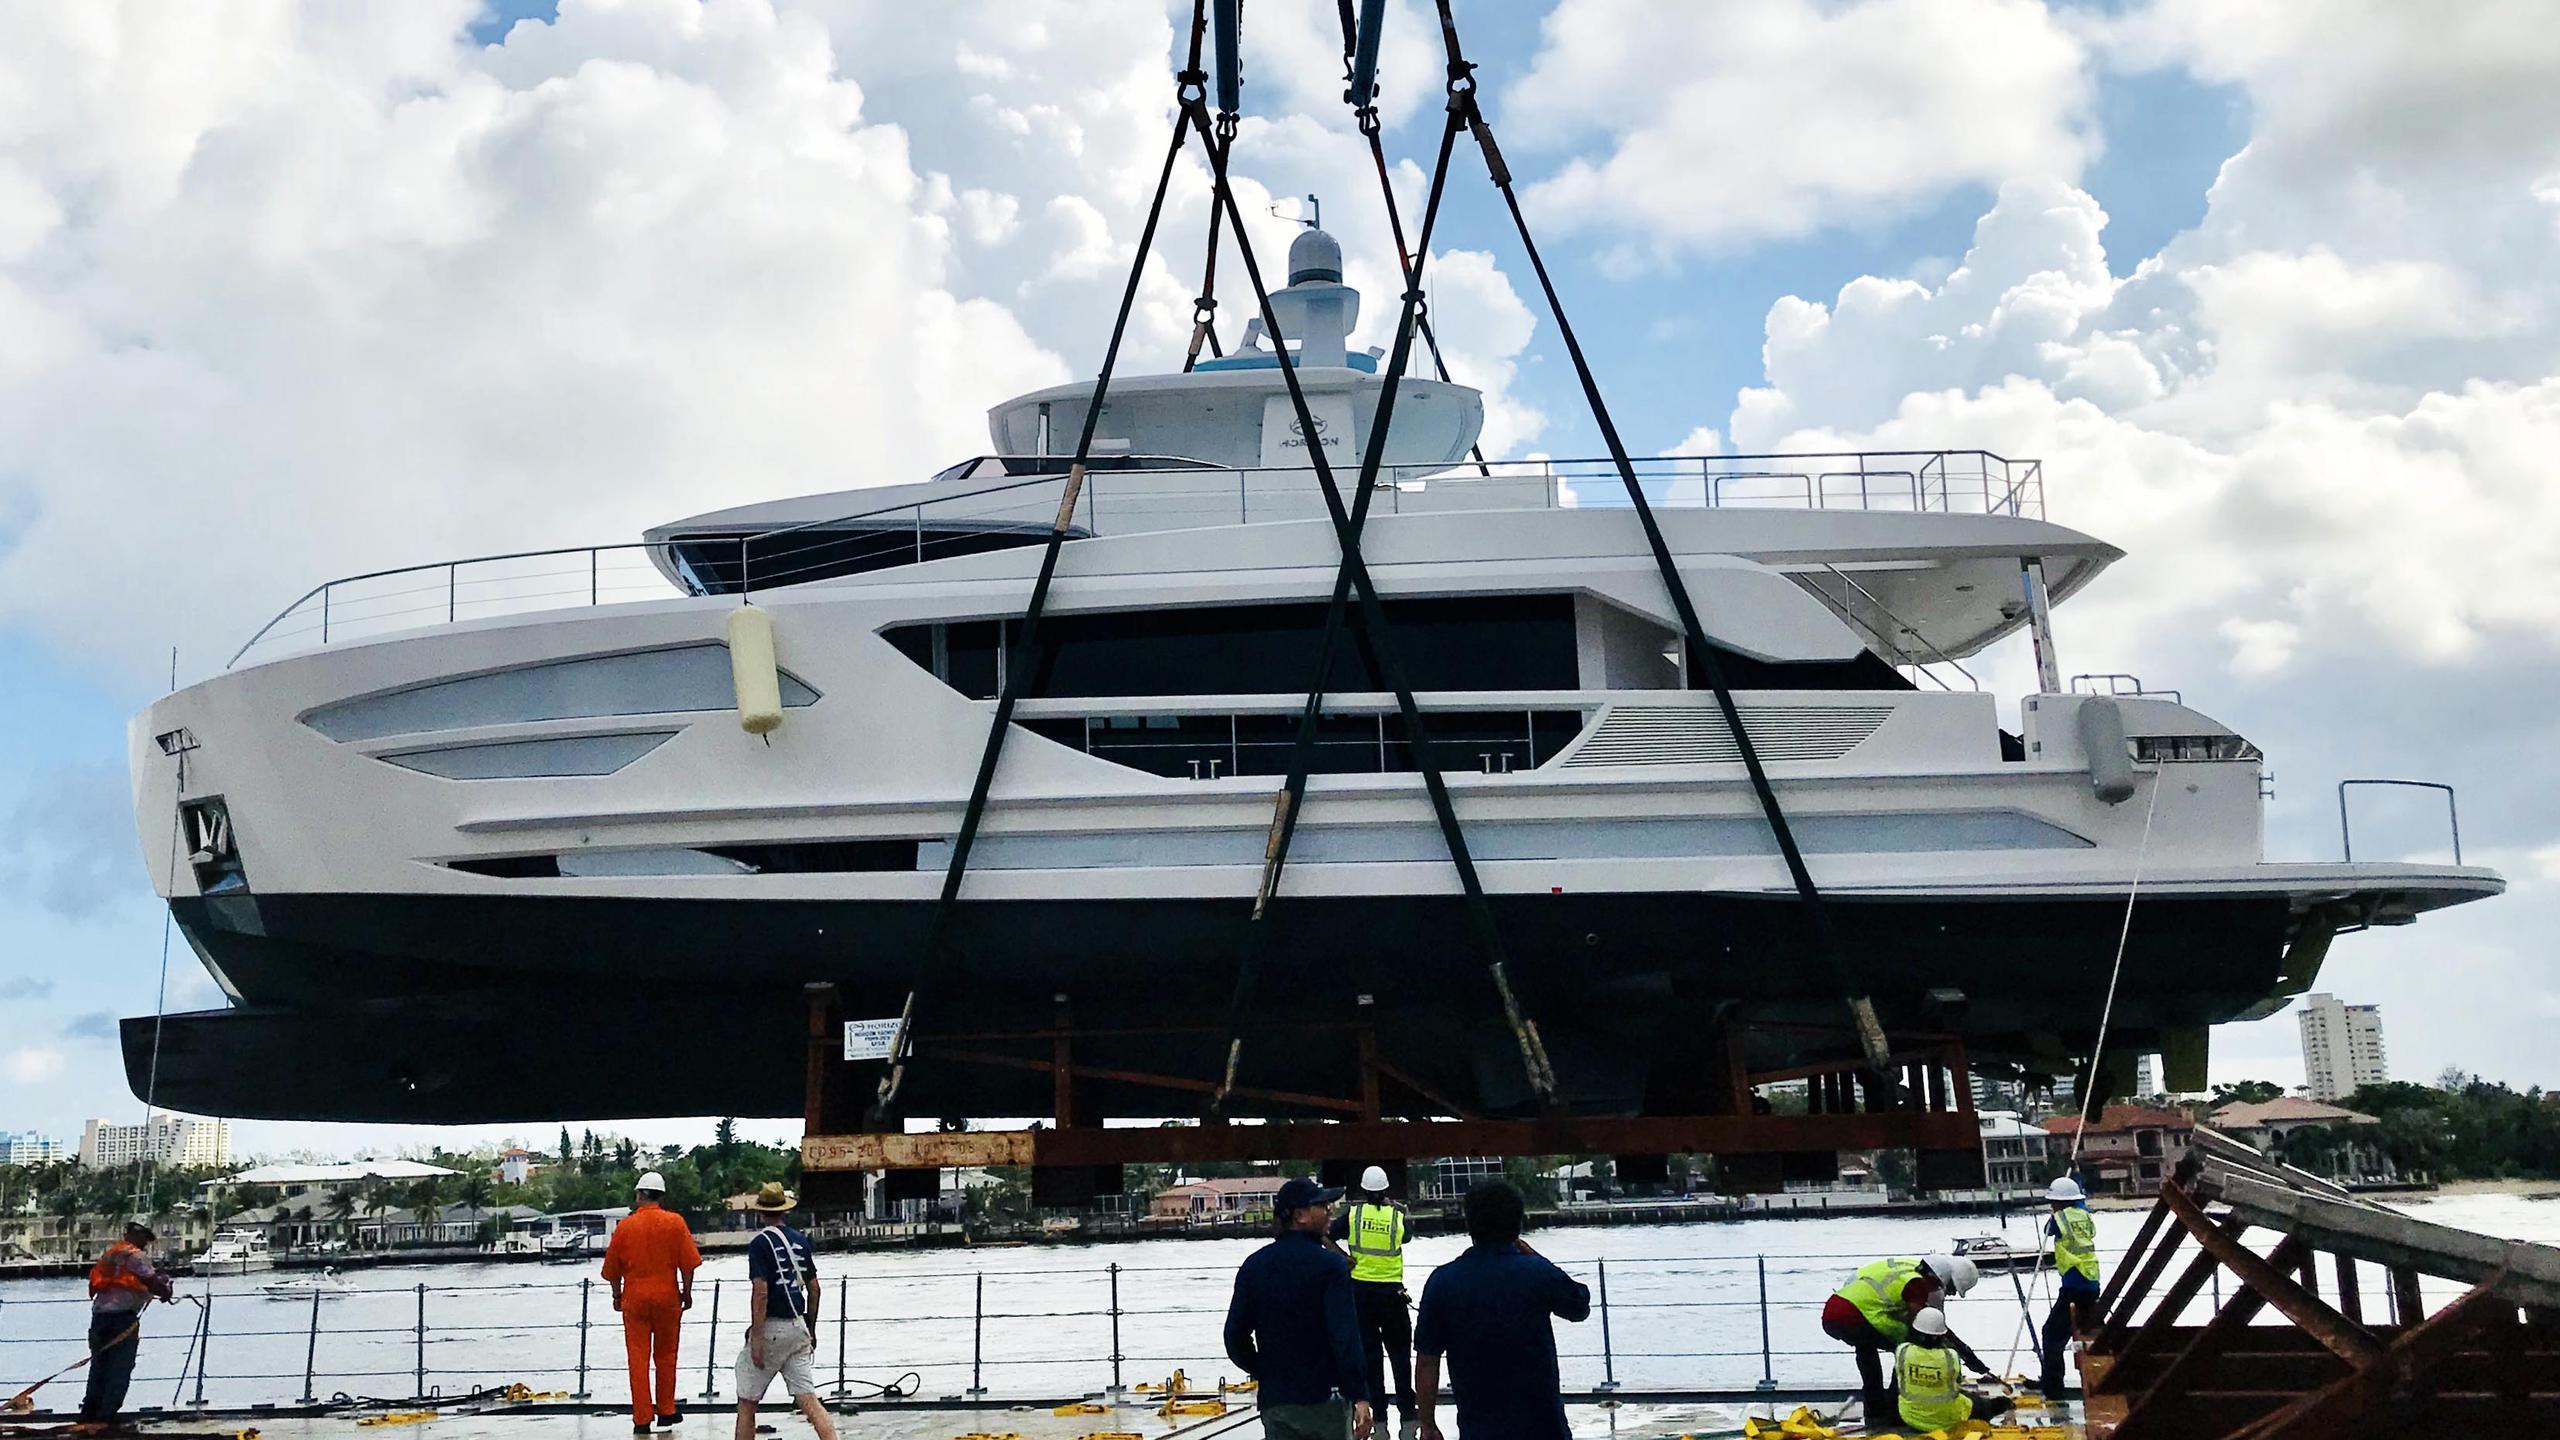 fd85 hull 3 motoryacht horizon 26m 2017 launch profile